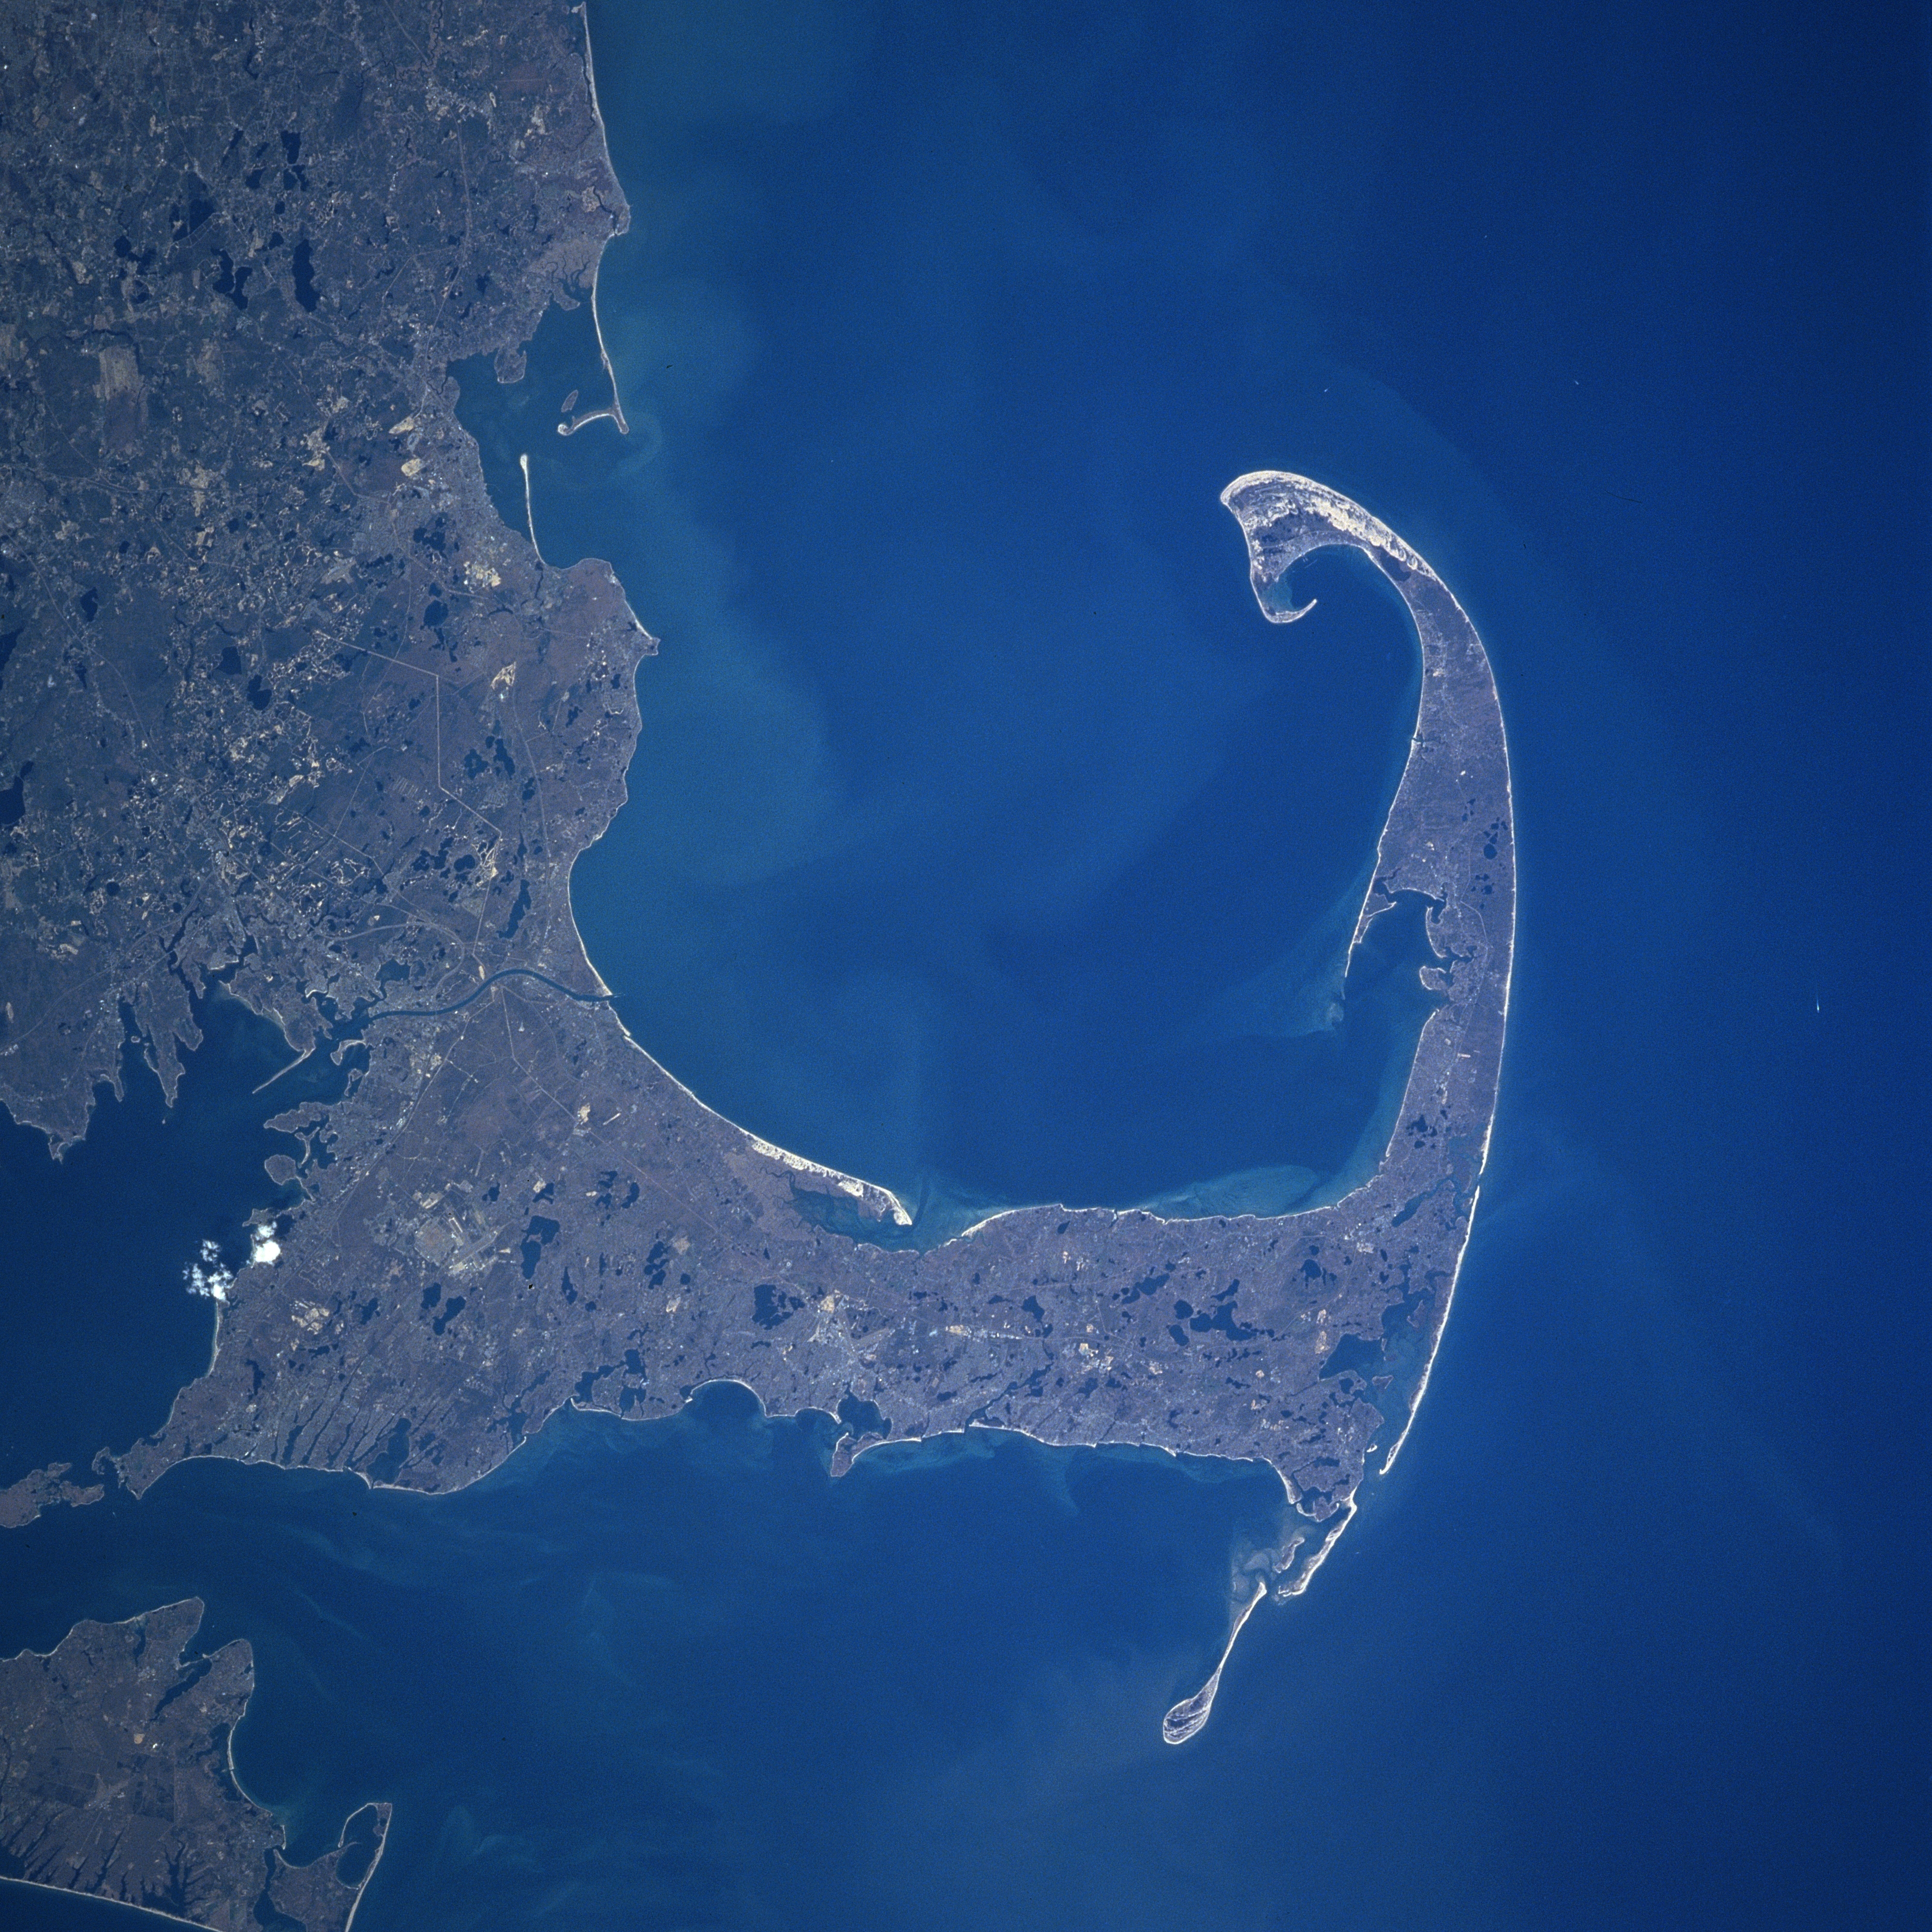 Cape cod bay.jpg